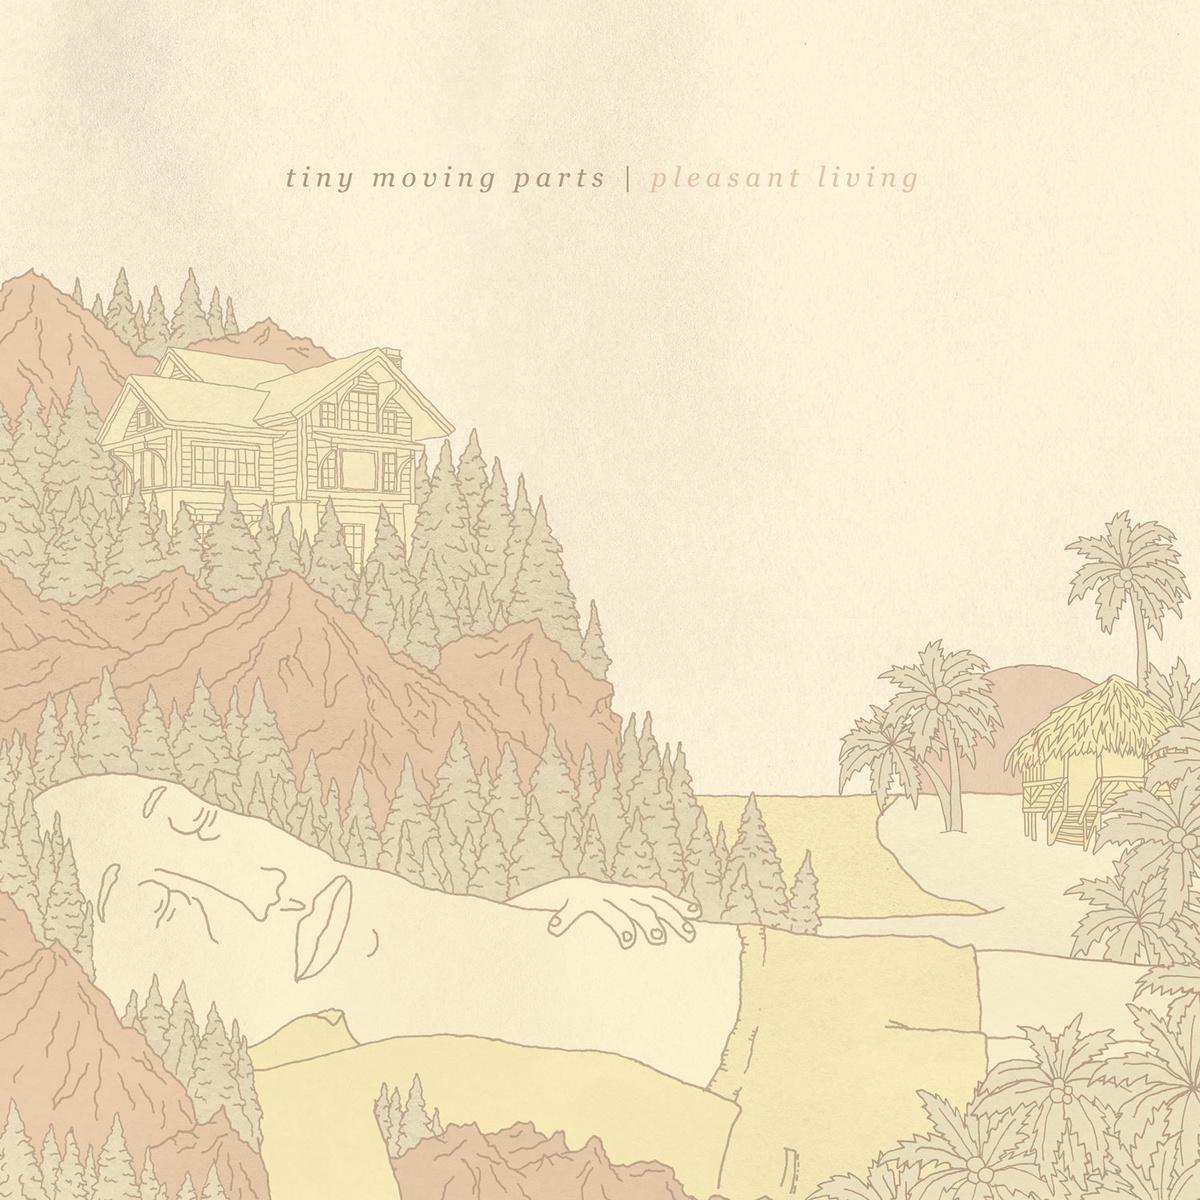 """Pleasant Living"" album cover courtesy of Triple Crown Records"